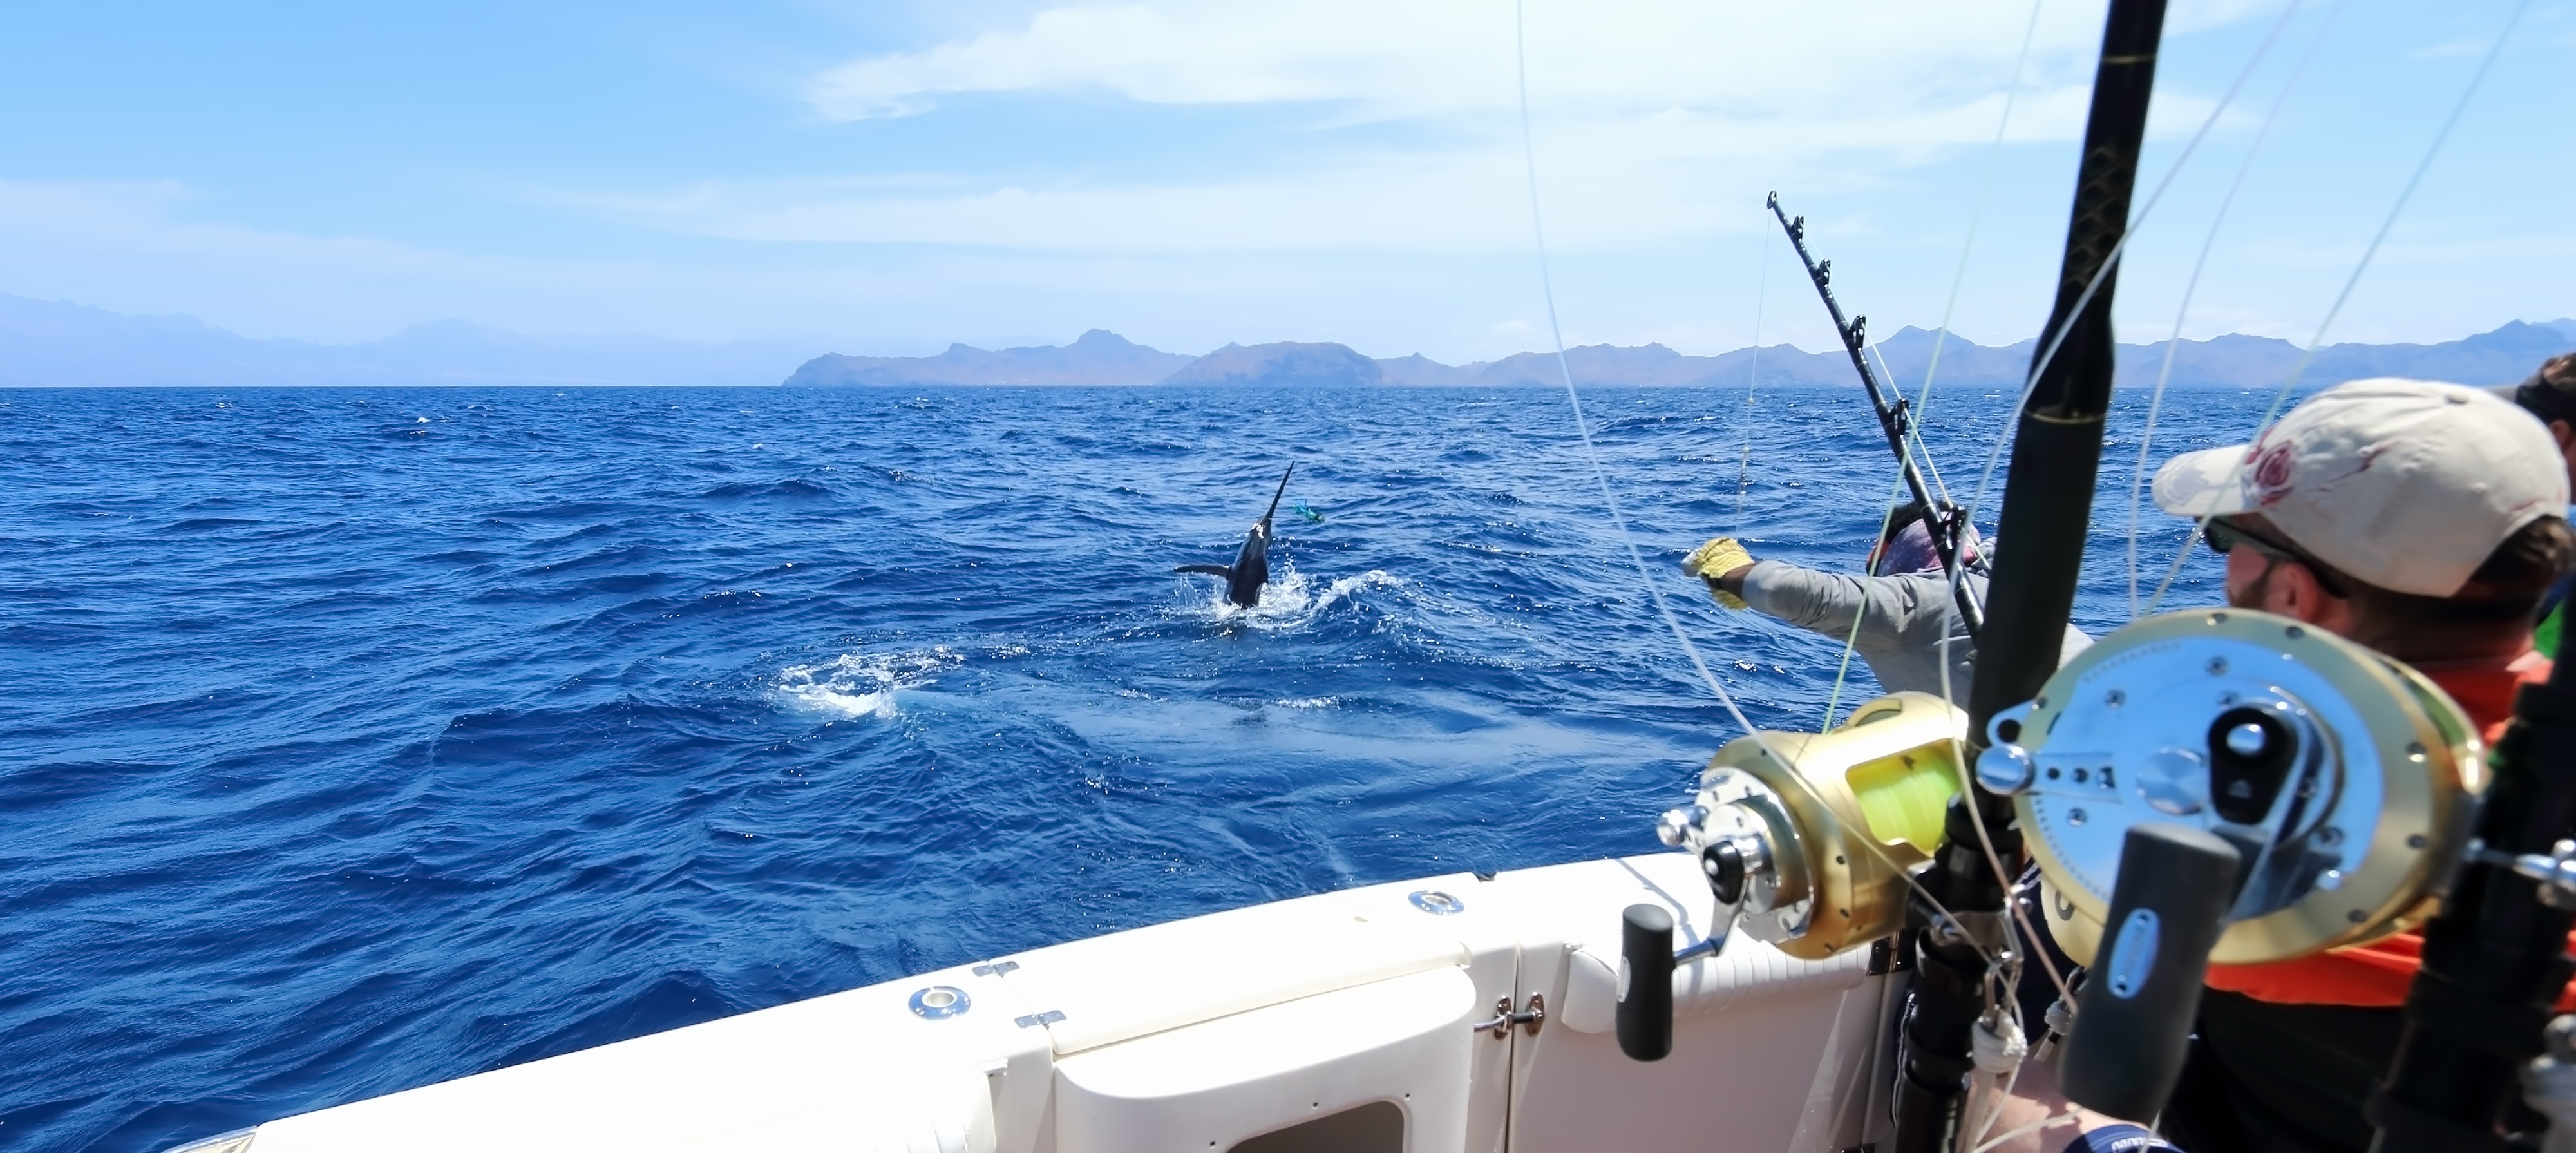 Essentials to Bring on a Deep Sea Fishing Trip